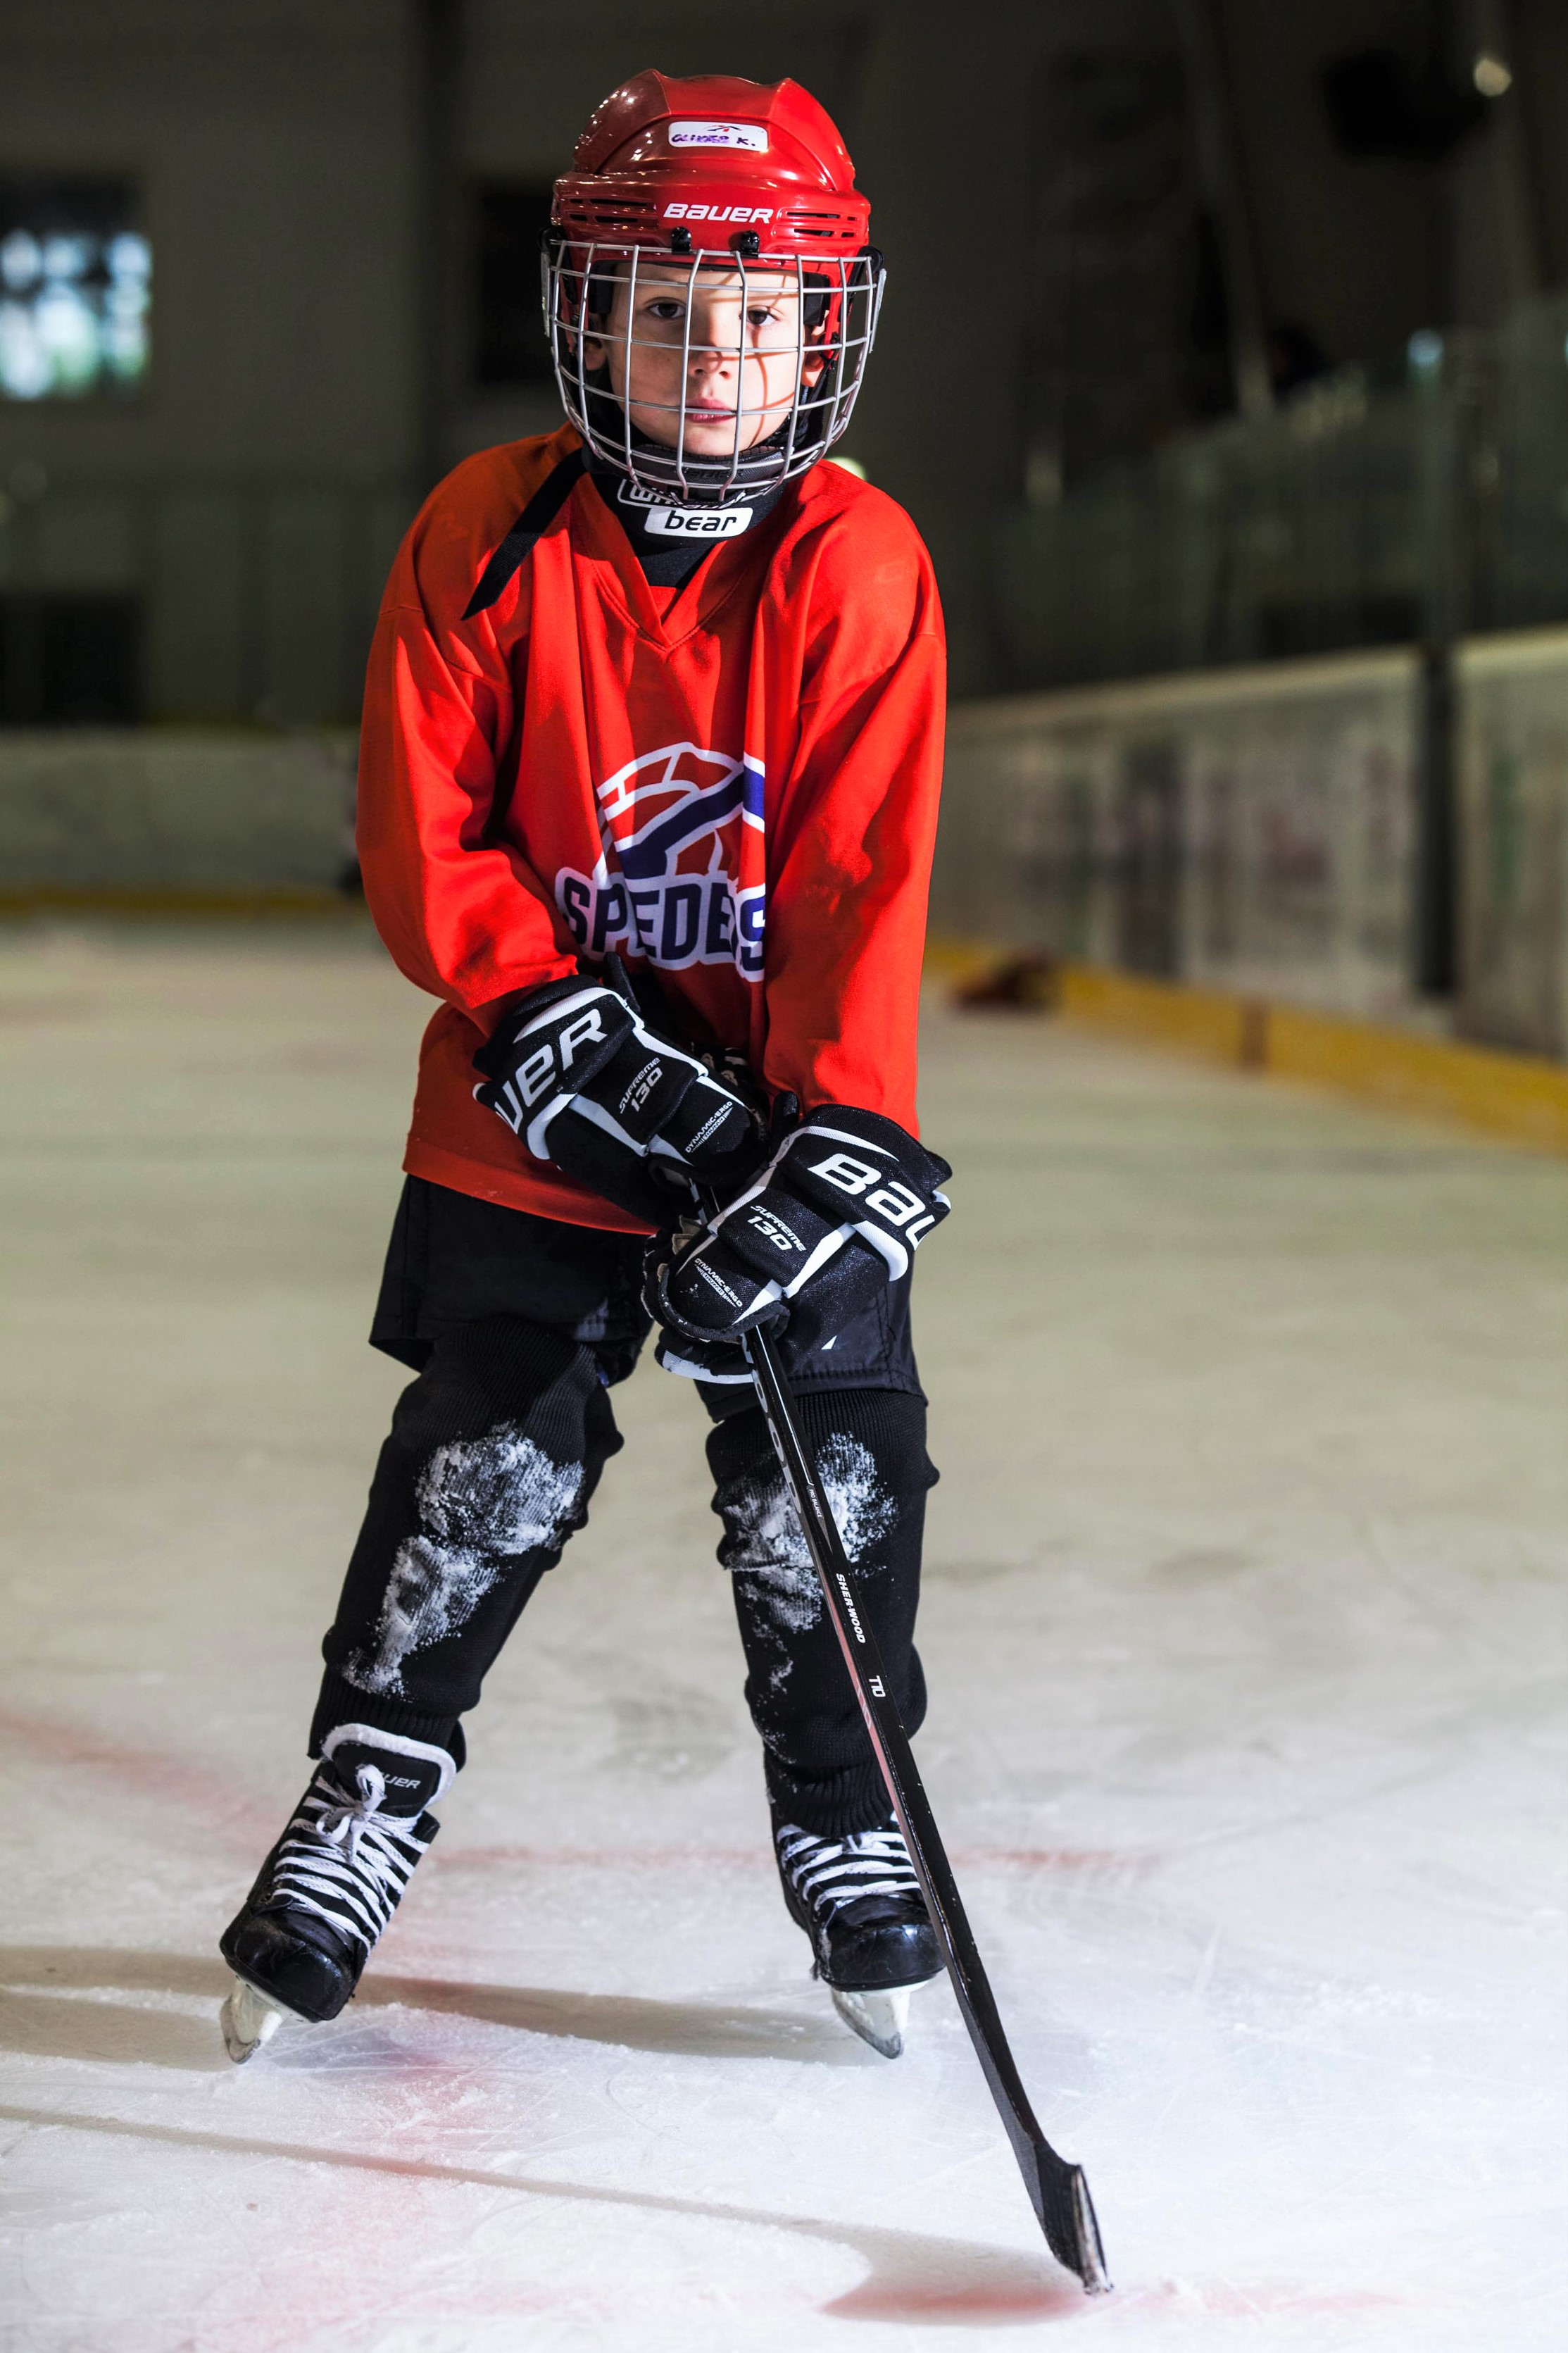 Oliver Kalma Speeders Bratislava hokejovy postoj